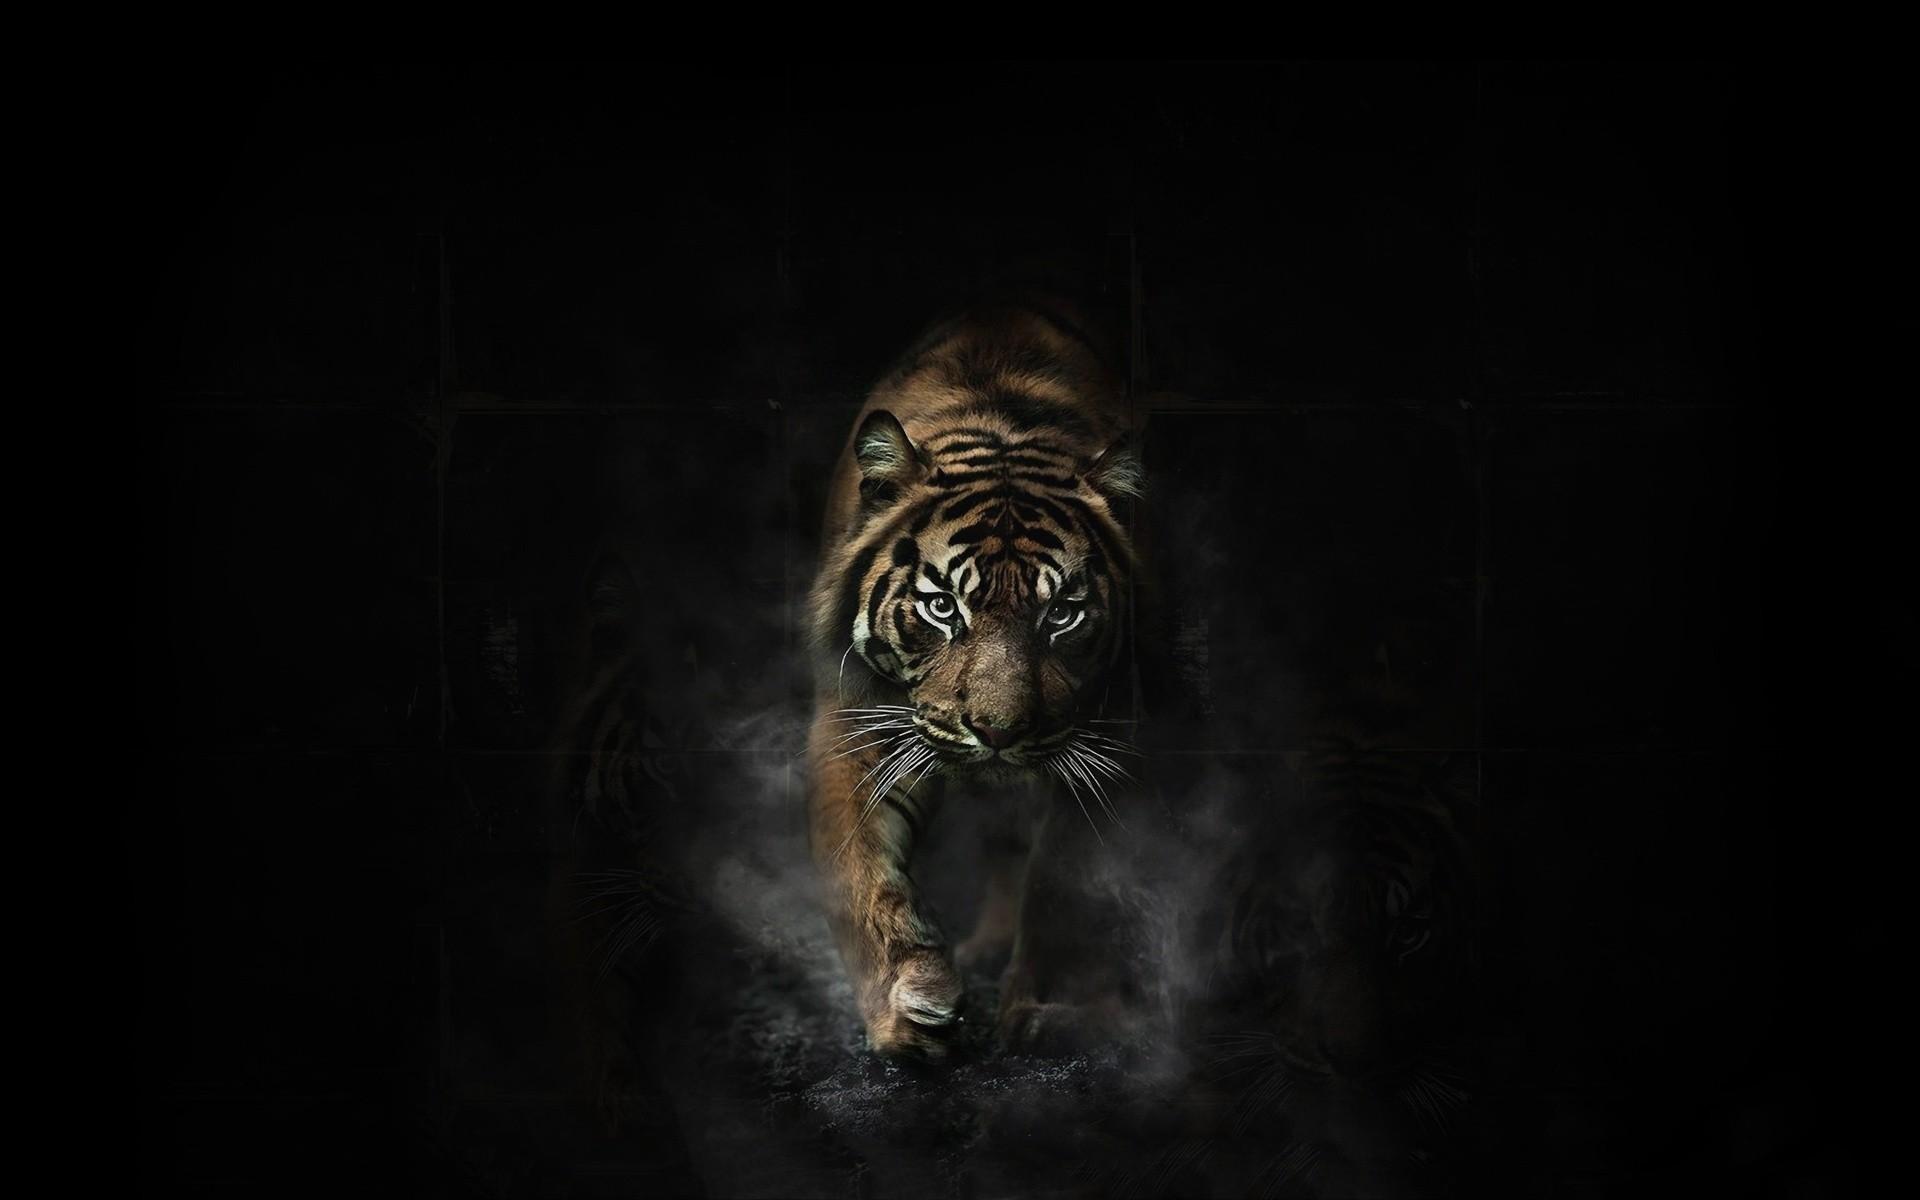 Tiger Wallpapers Best Wallpapers 1920×1200 Tigar Wallpapers (32 Wallpapers)    Adorable Wallpapers